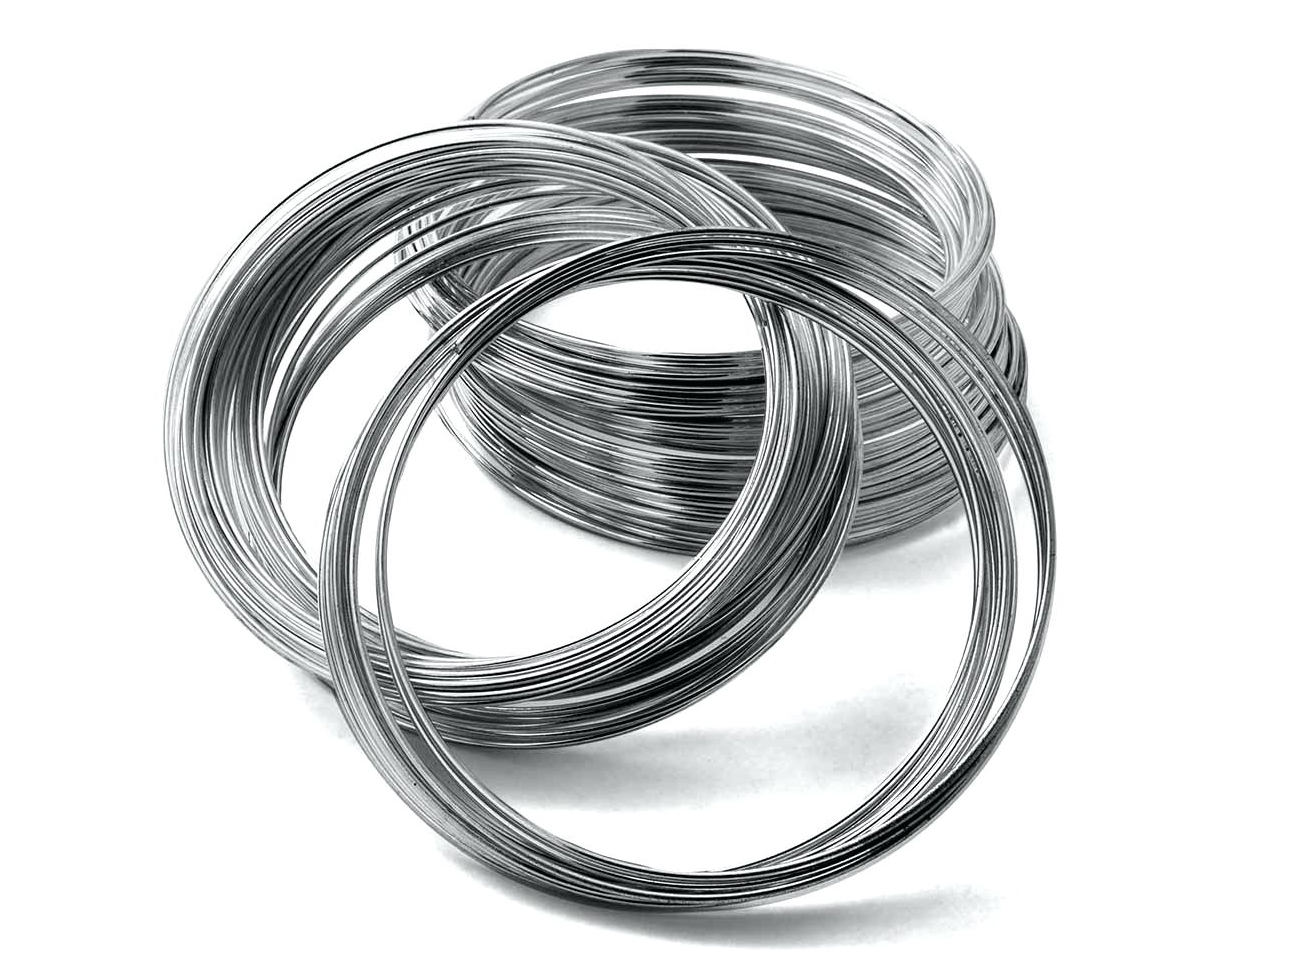 memory-wire-1-bracelet-video-tutorial